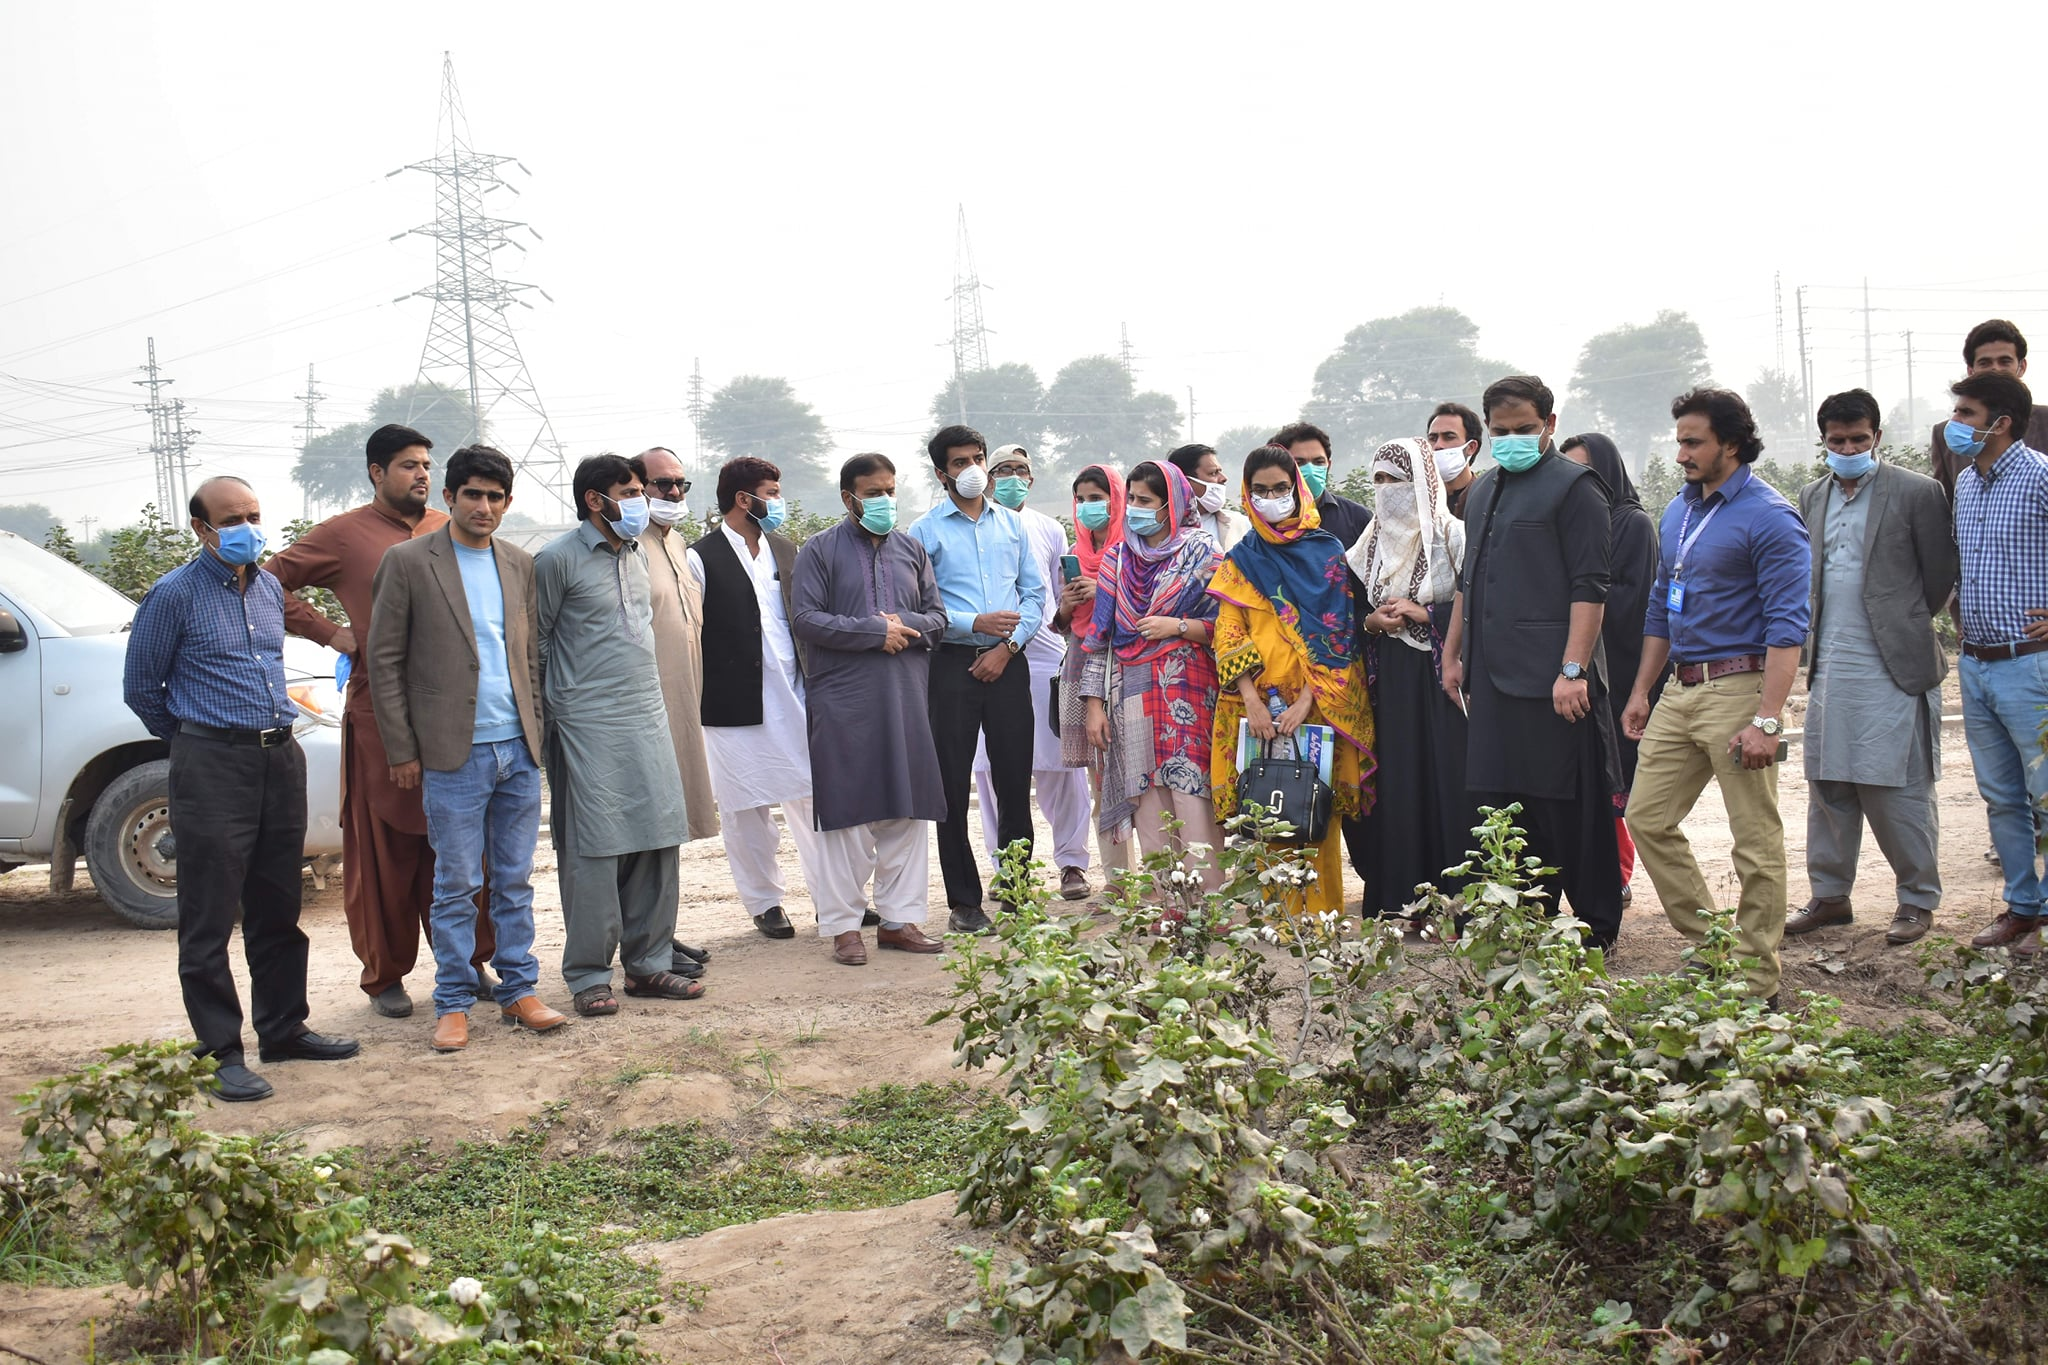 A delegation of Lok Sanjh Foundation comprising Producer Unit Managers and Area Coordinators from Layyah, Bhakkar, TT Singh, Fort Abbas, Bahawalnagar, Chishtian visited CCRI Multan.